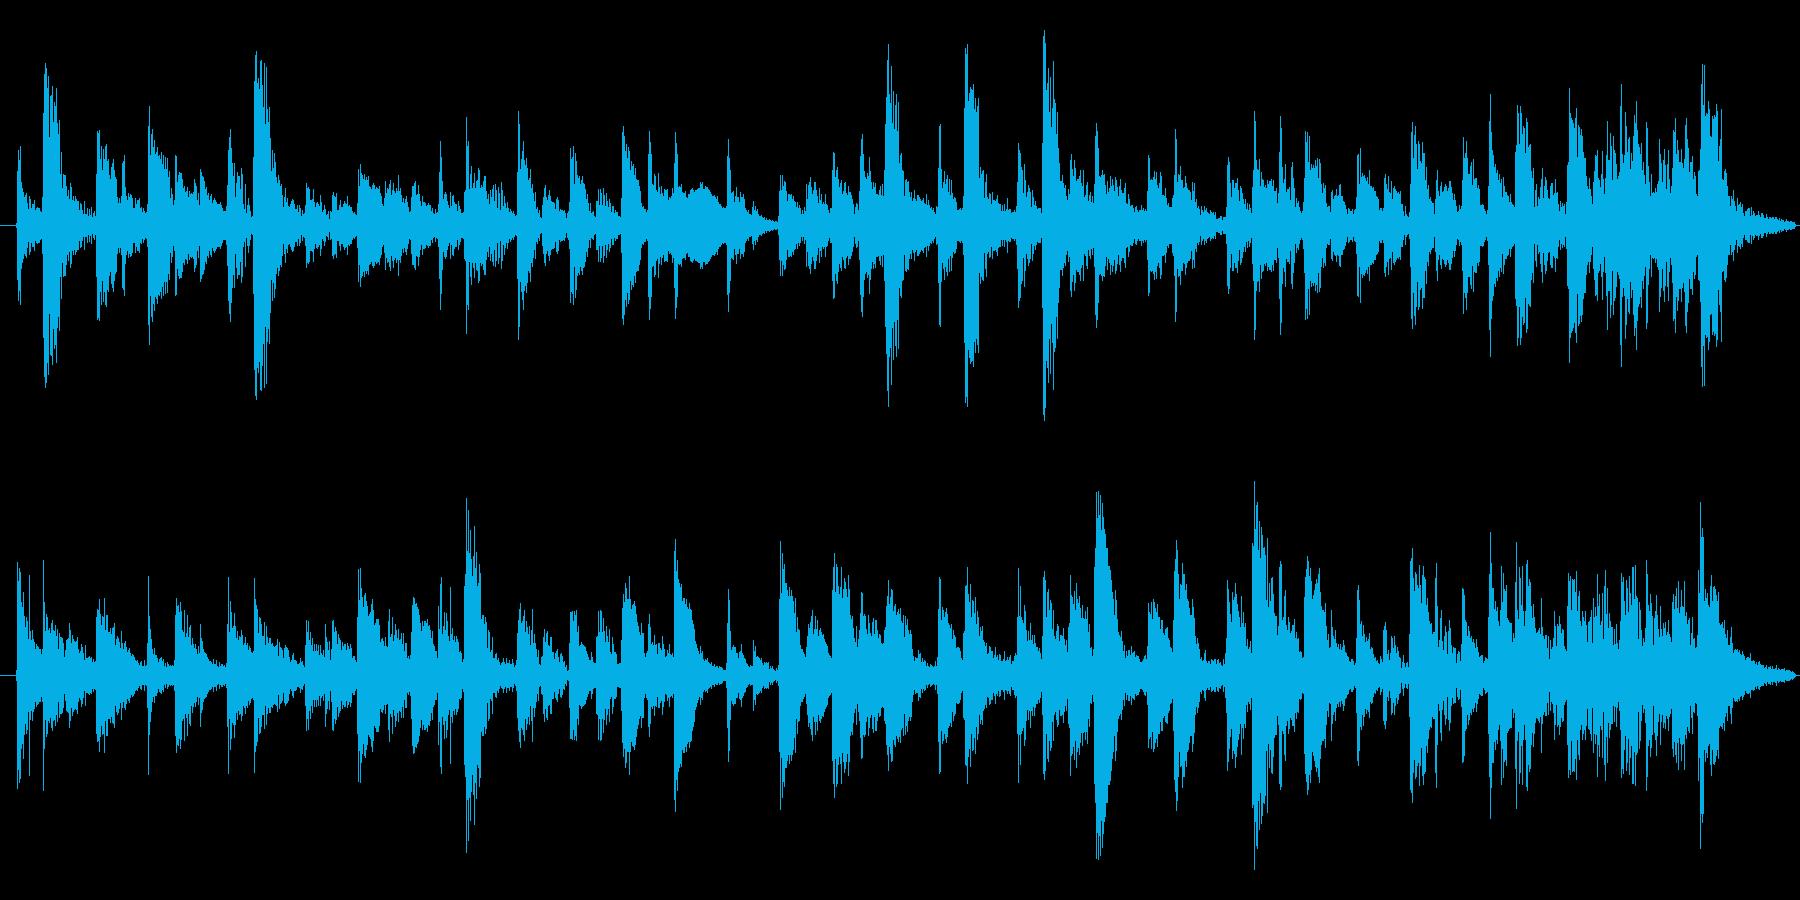 Gt をフューチャーした、ラテン系の爽…の再生済みの波形